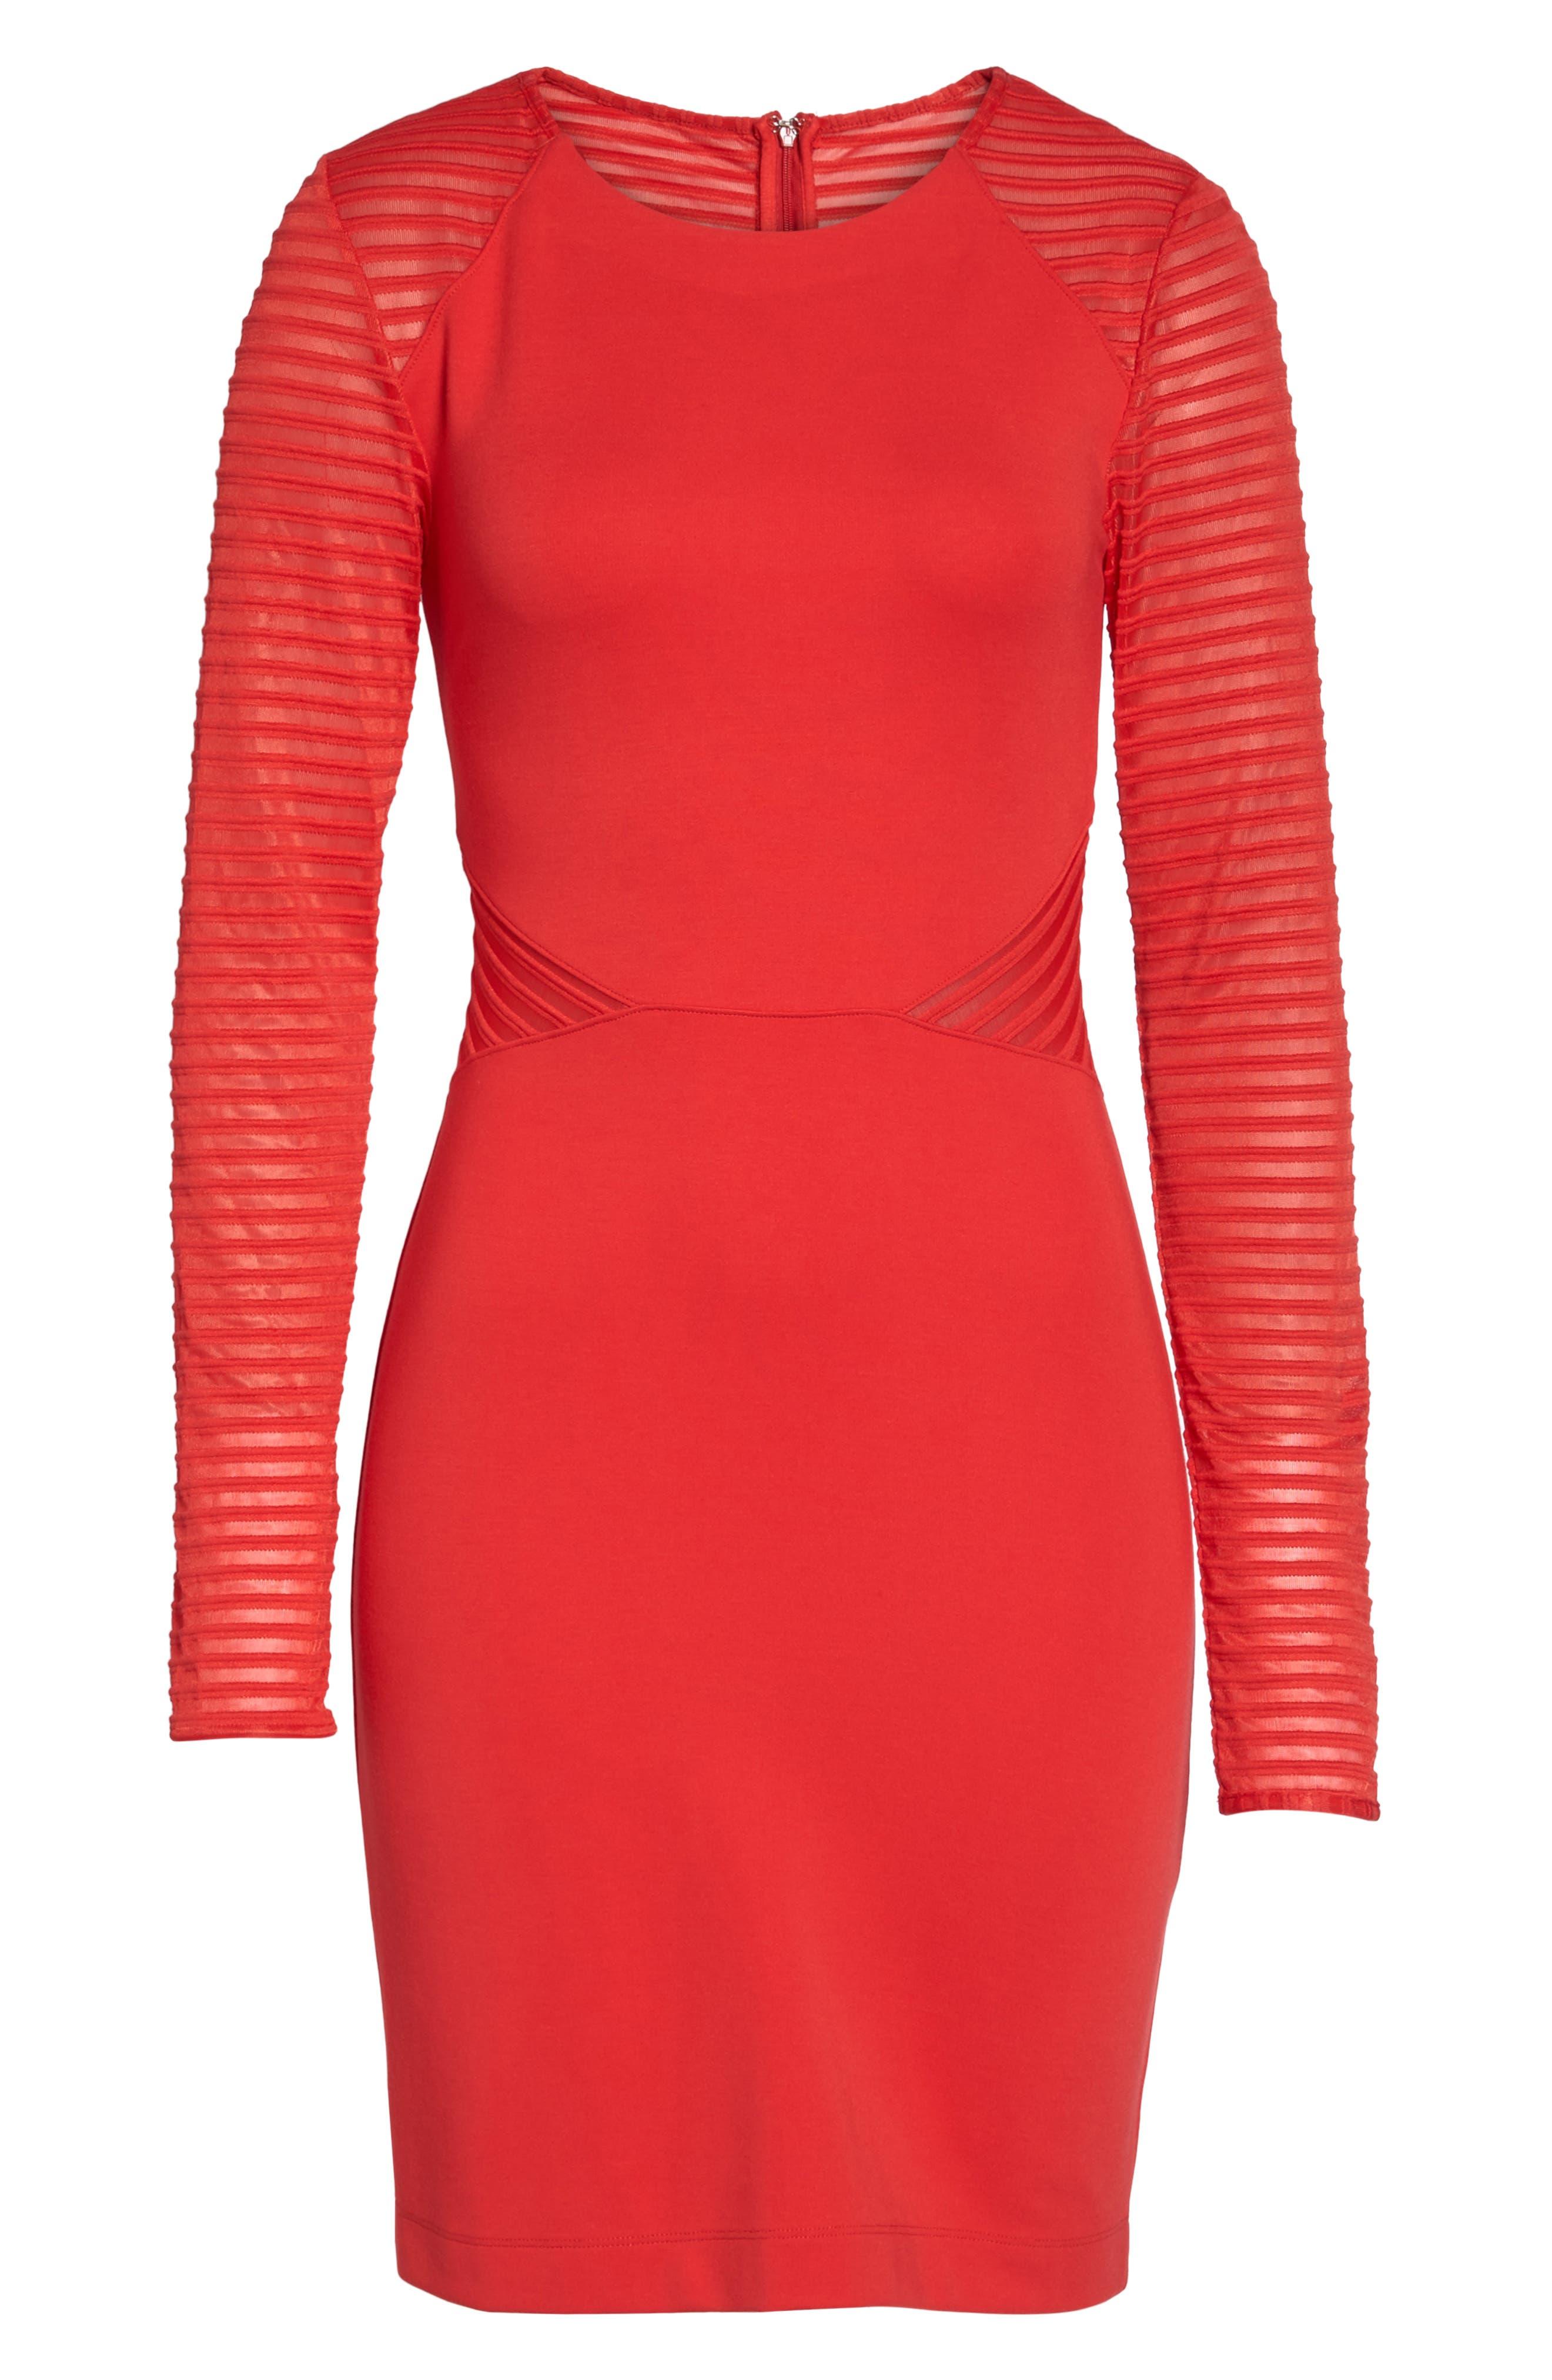 Thiestis Body-Con Dress,                             Alternate thumbnail 12, color,